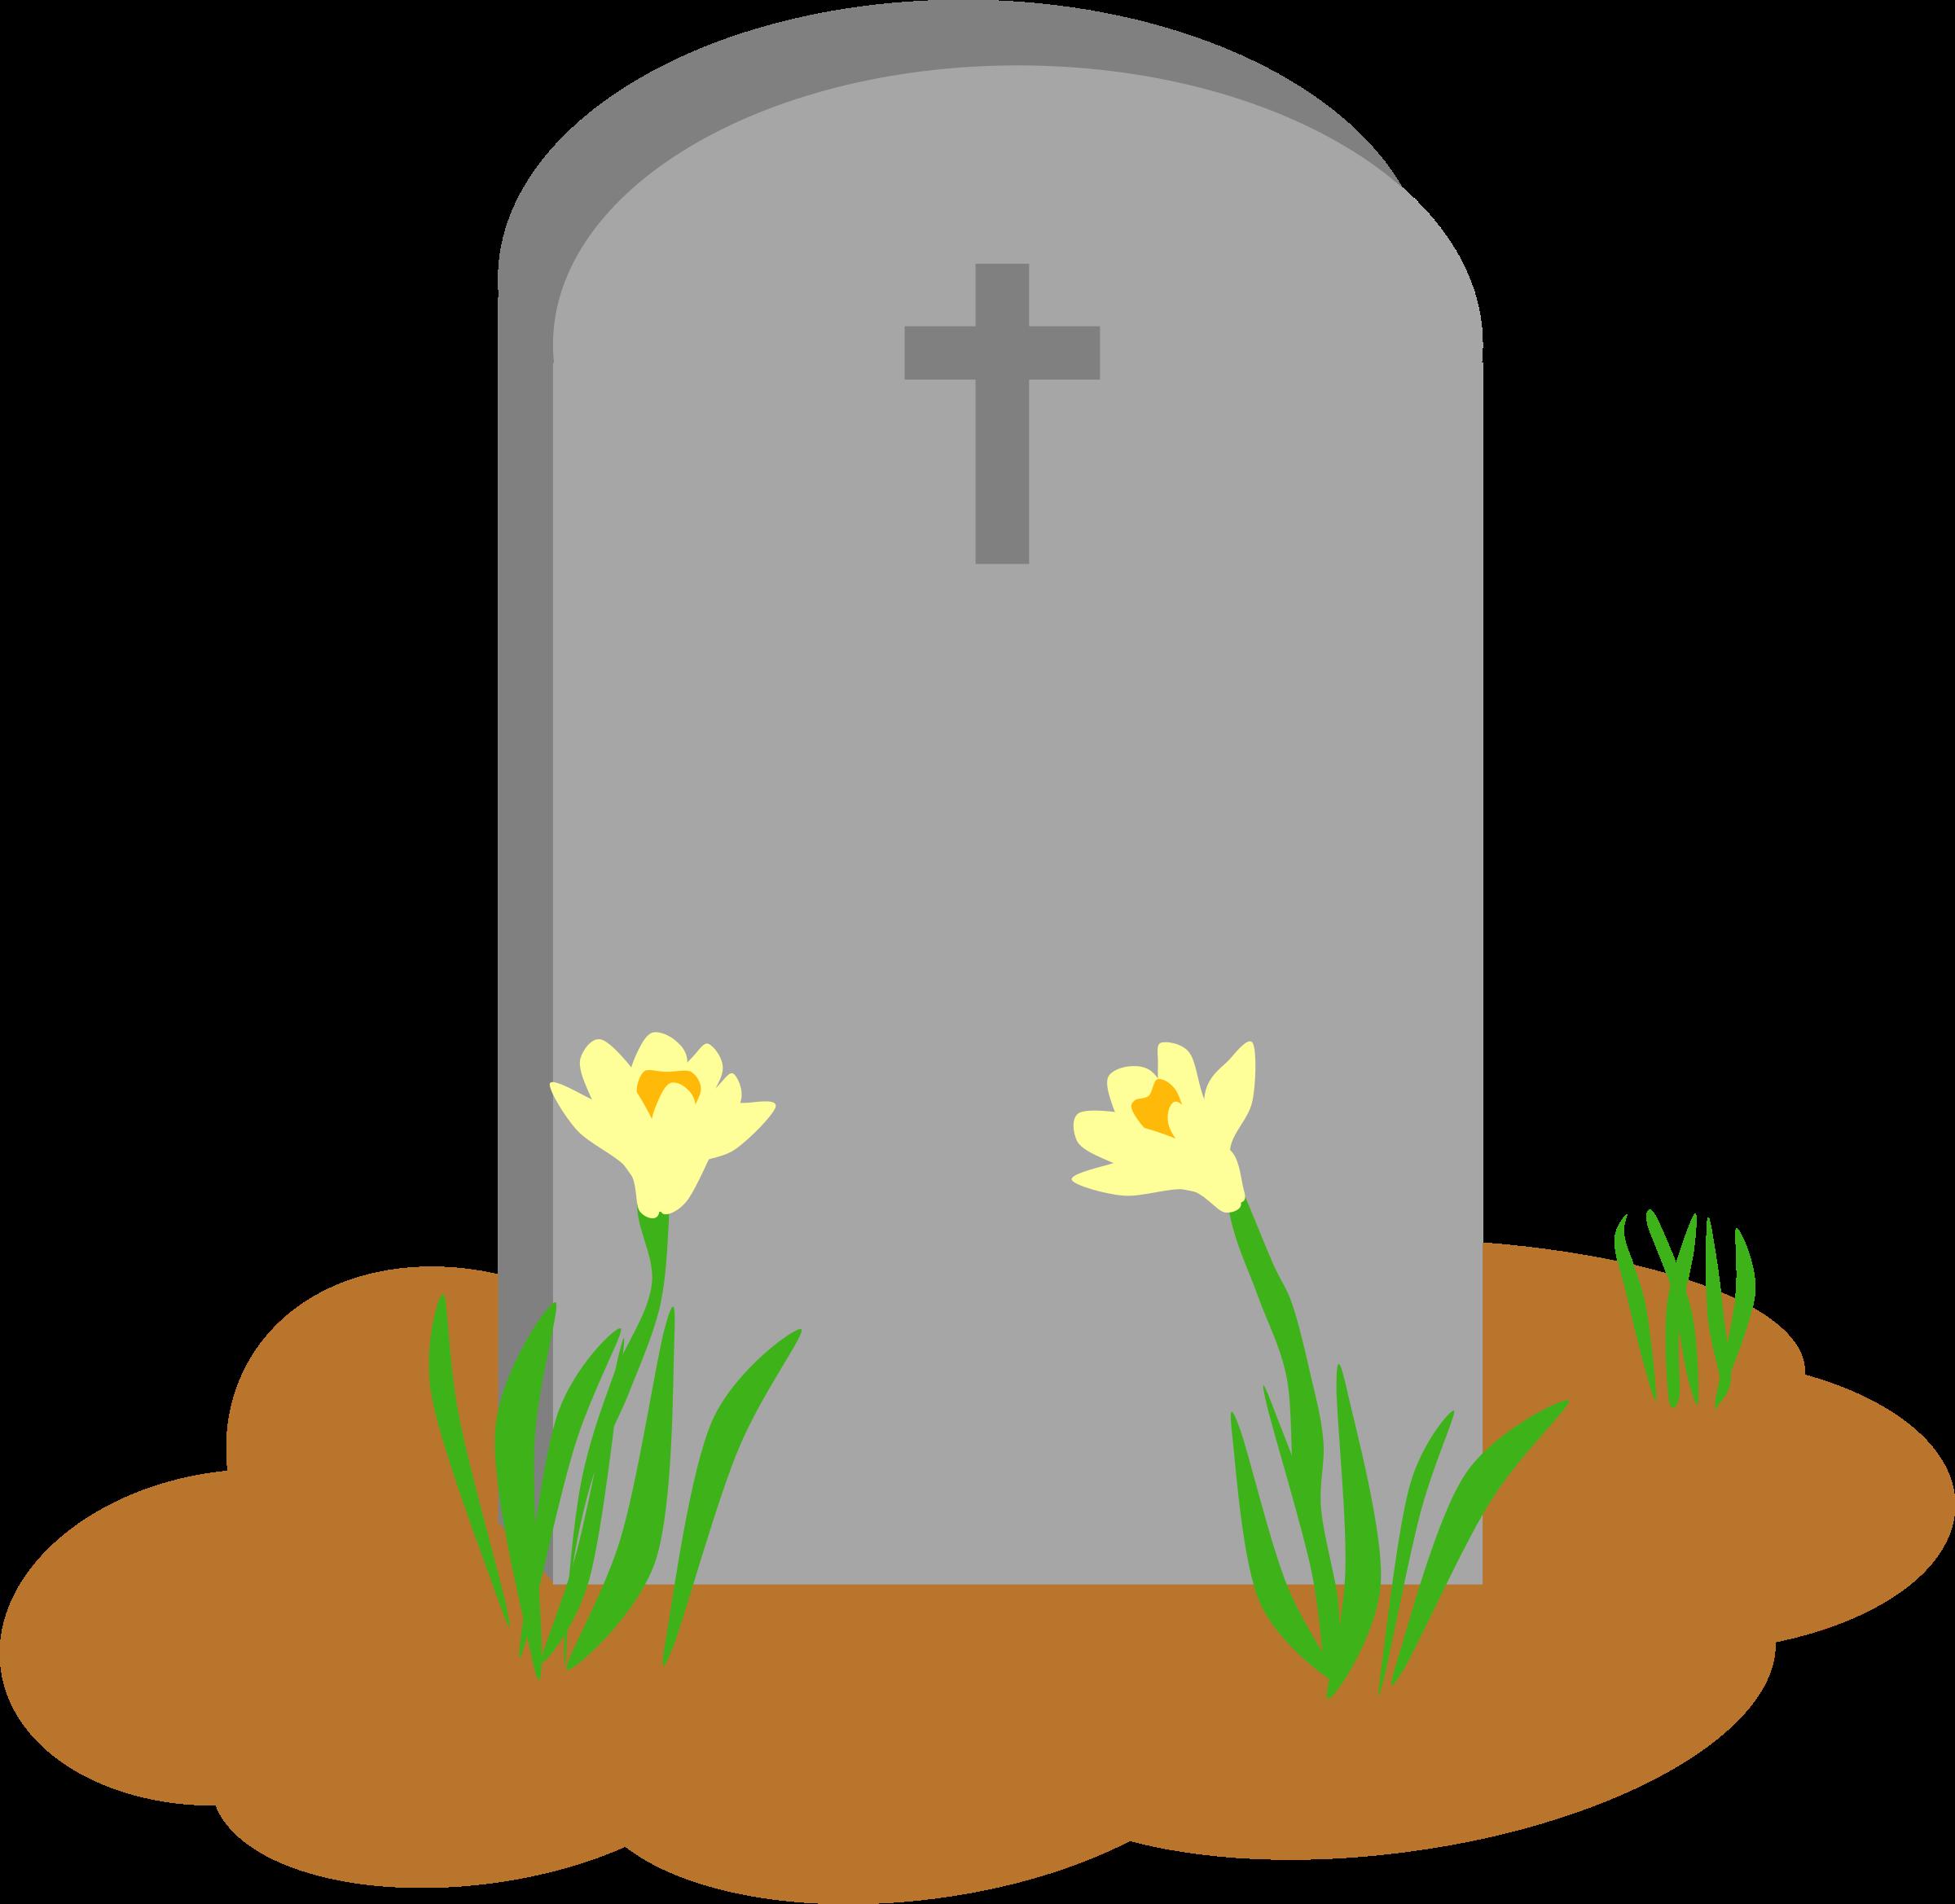 Grave PNG Images Transparent Free Download.